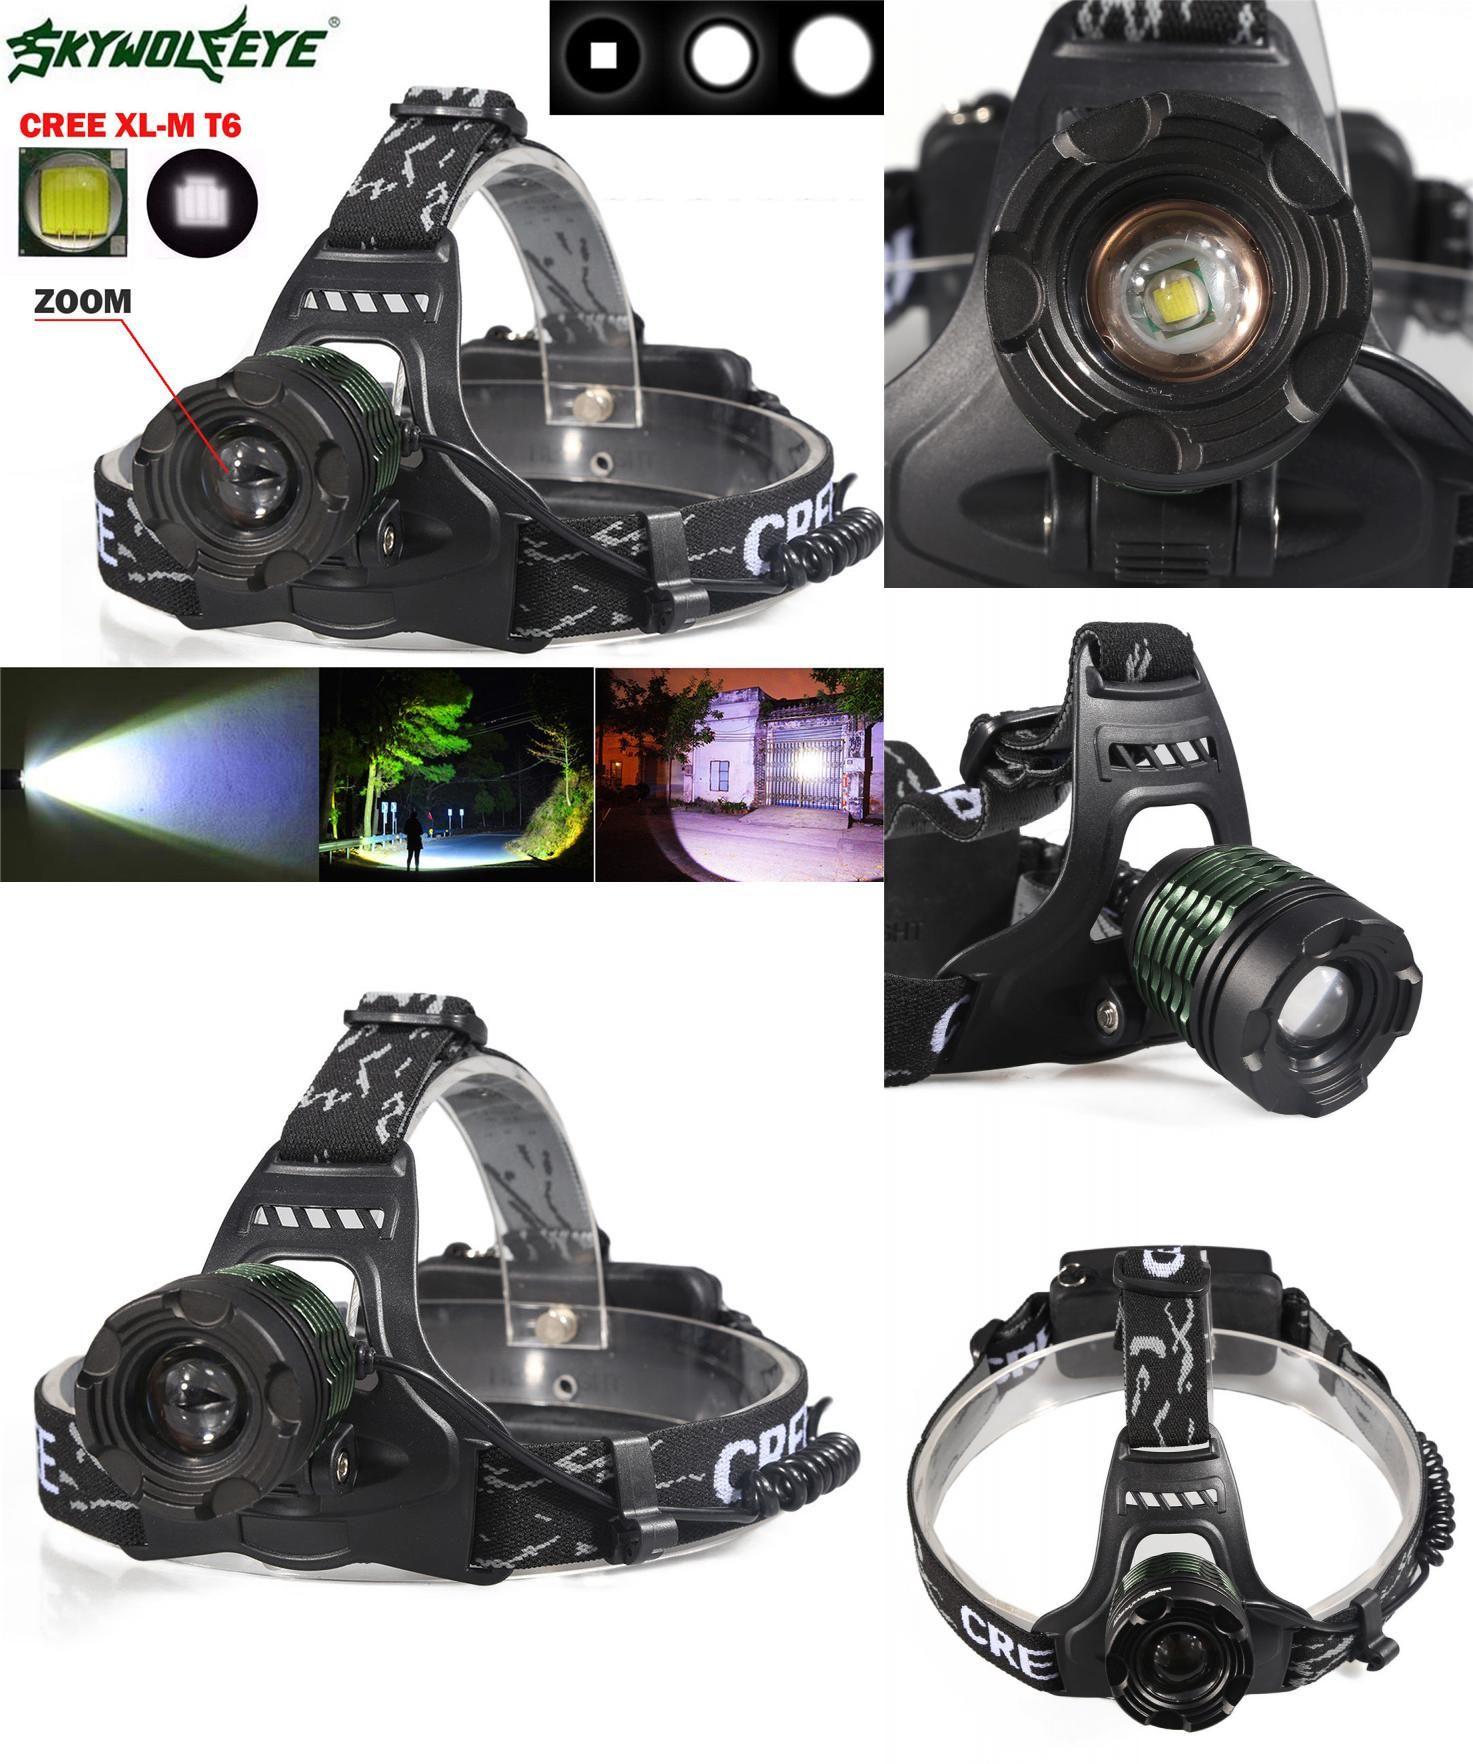 [Visit to Buy] skywolfeye outdoor Headlamps 5000 Lm CREE XM-L XML T6 LED Headlamp Headlight 18650 L7118 fishing DROP SHIP #Advertisement